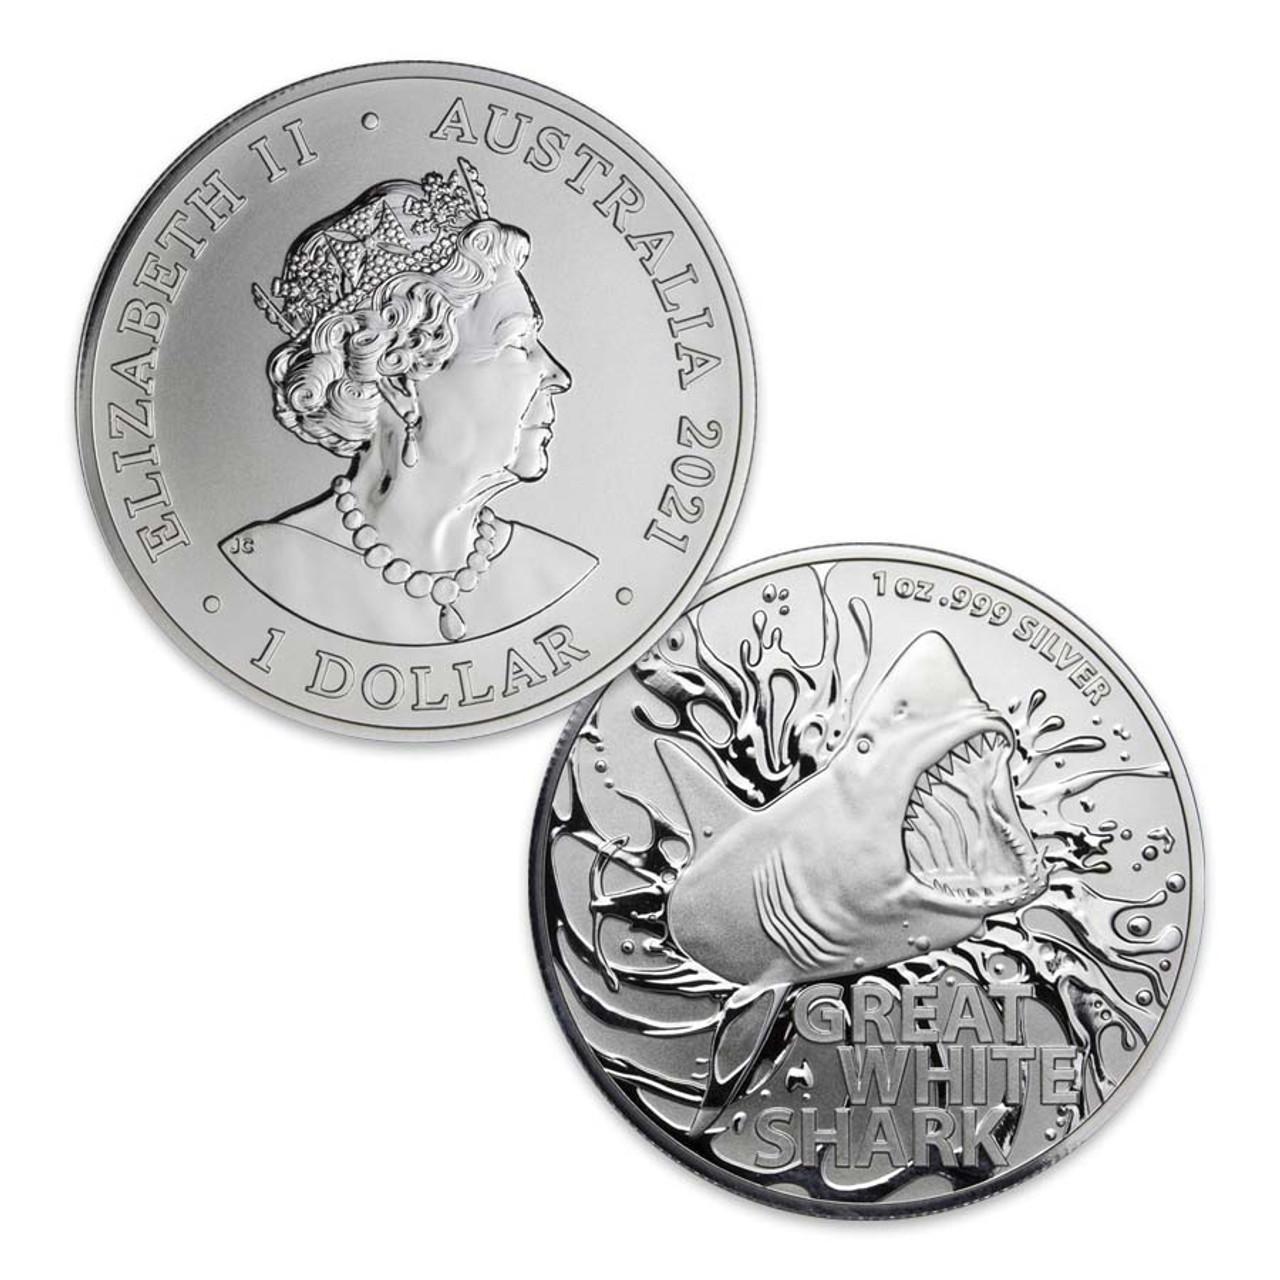 Australia 2021 Great White Shark 1-Oz. Silver Dollar Brilliant Uncirculated